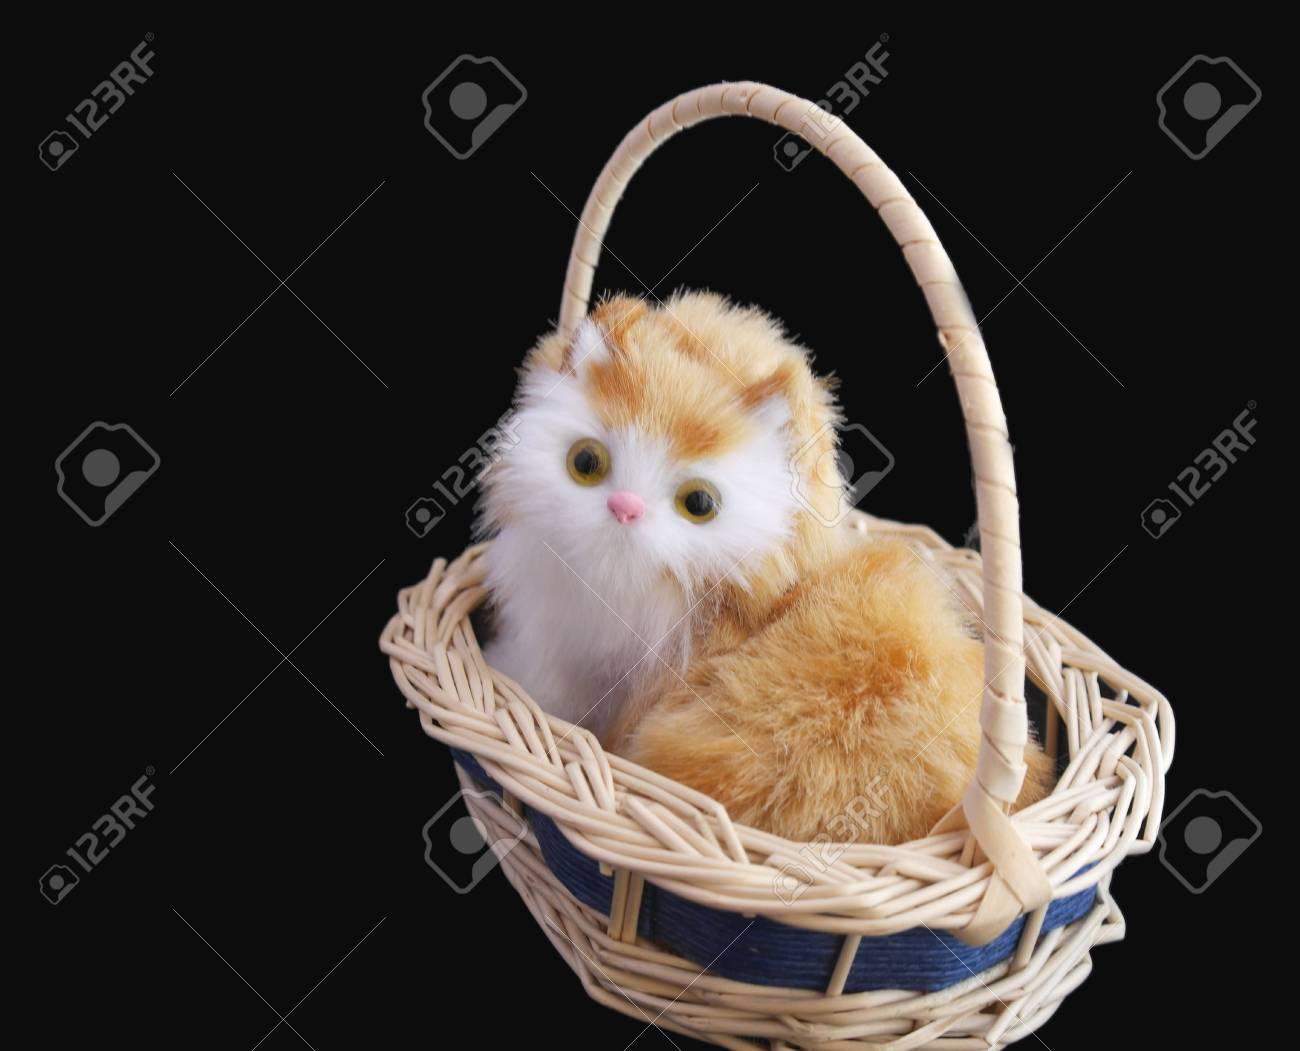 Pretty kitten in basket over black - 29791675